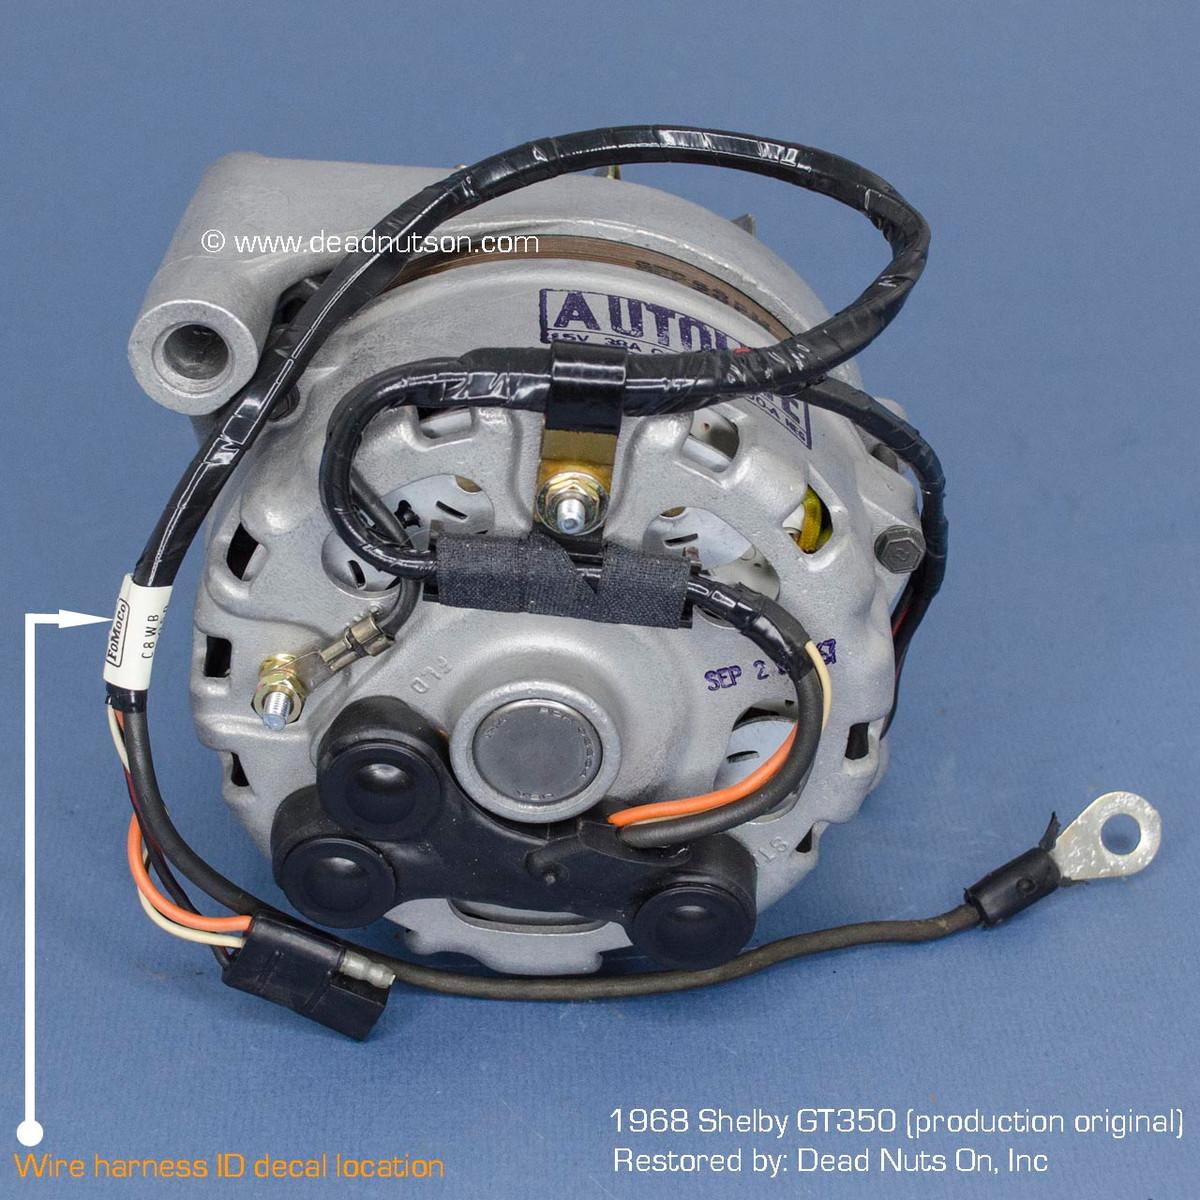 1968 mustang alternator wire harness tag 289,302 tach dash dead